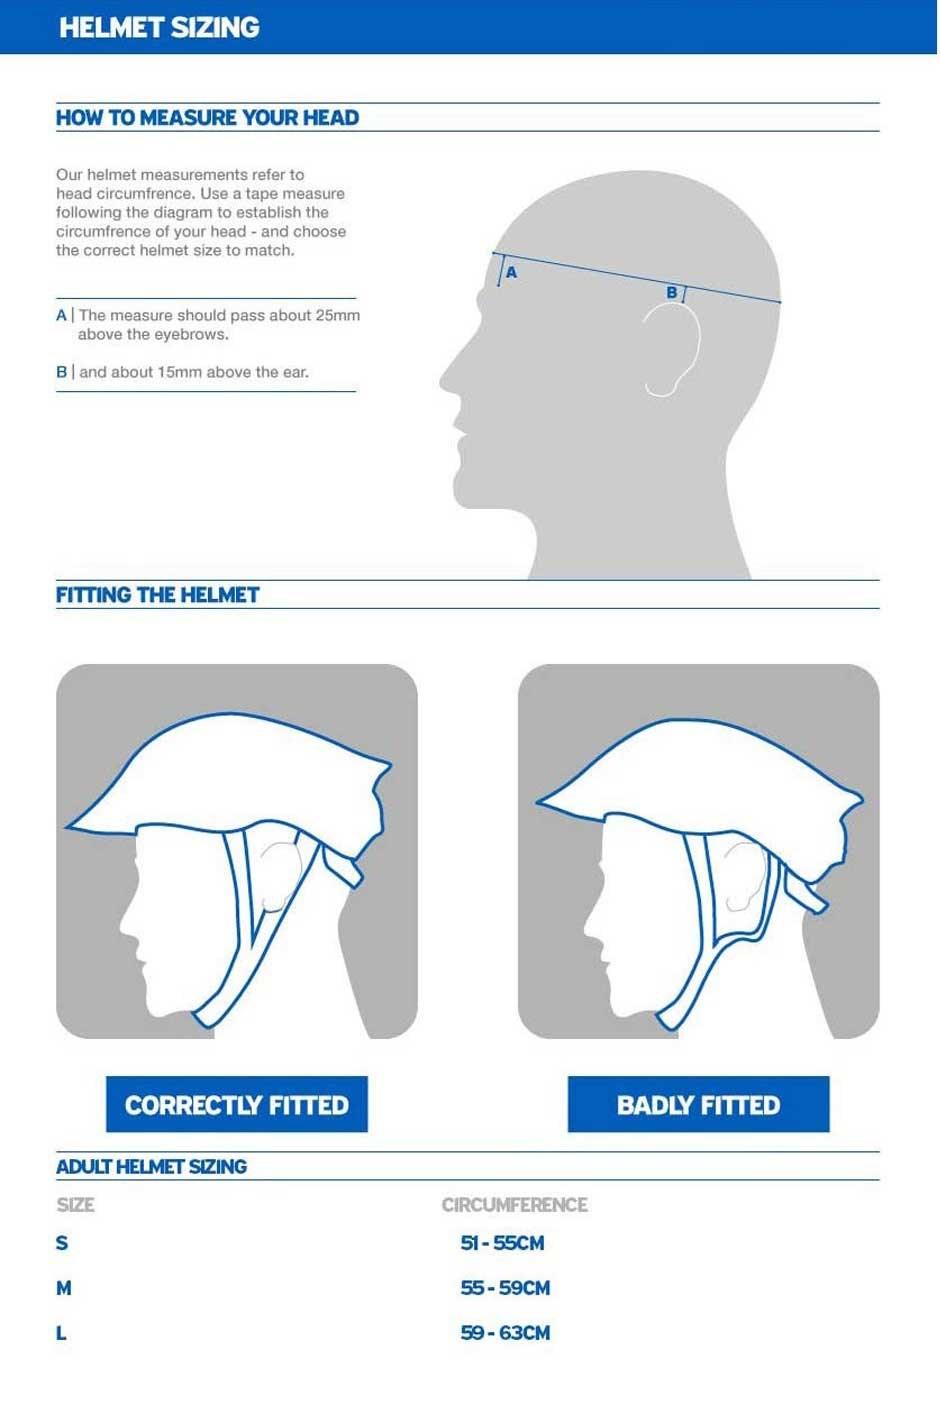 Giant Helmet sizing chart